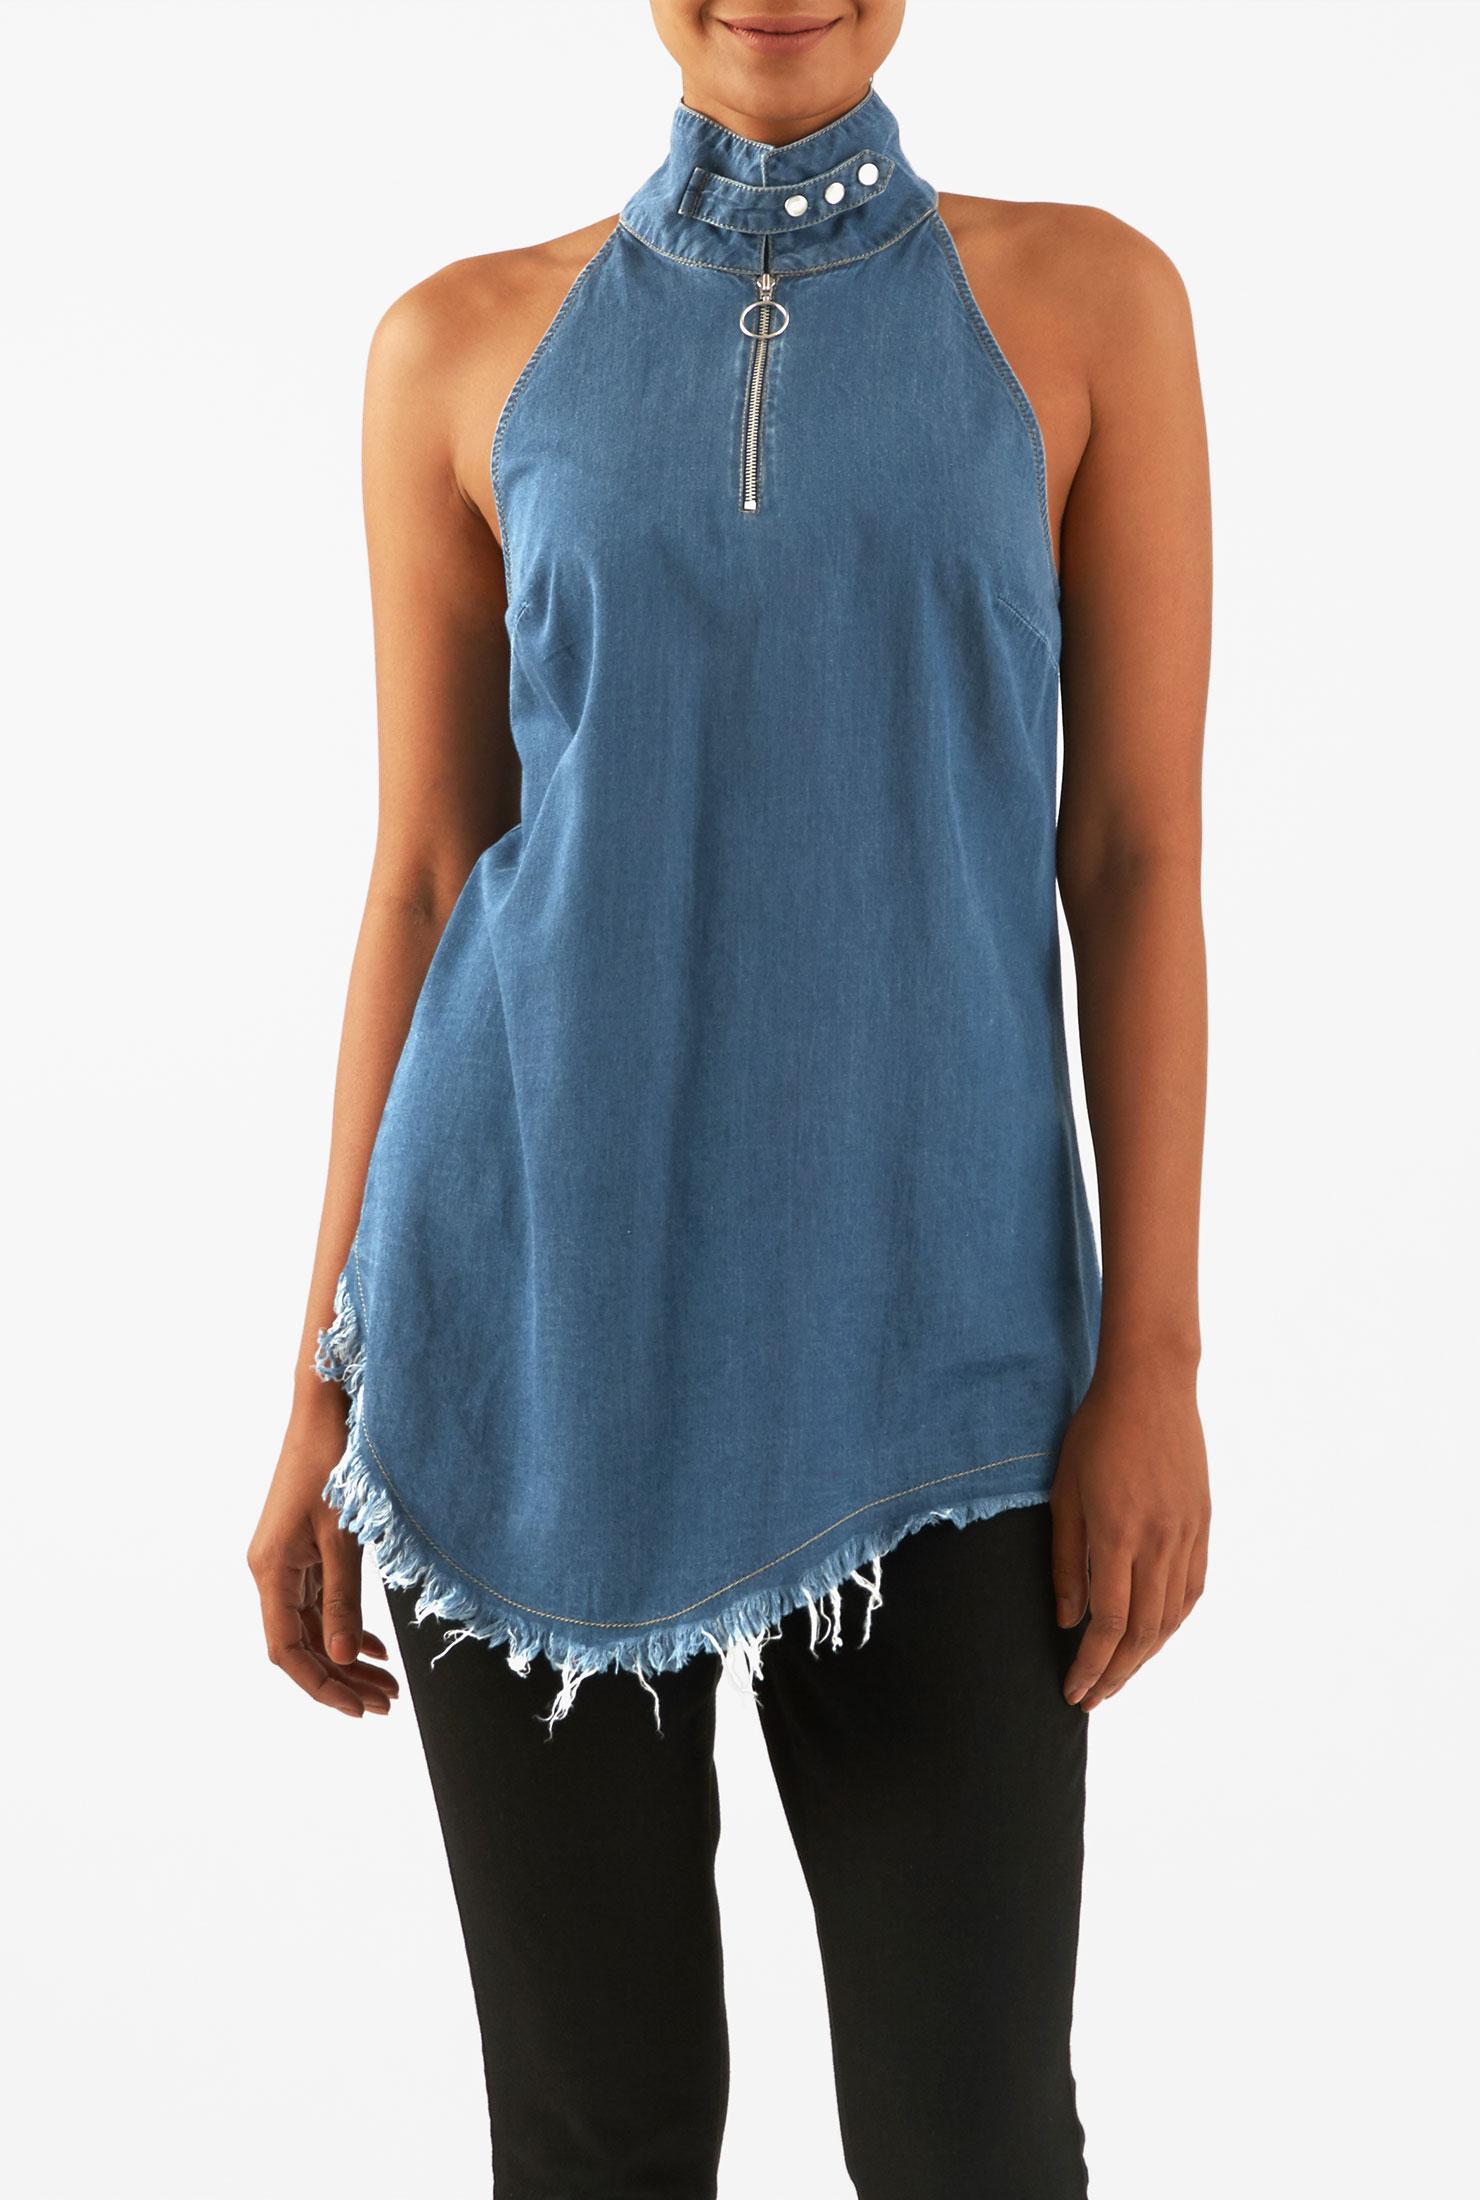 Eshakti Women S Frayed Edge Asymmetric Hem Cotton Denim Top image